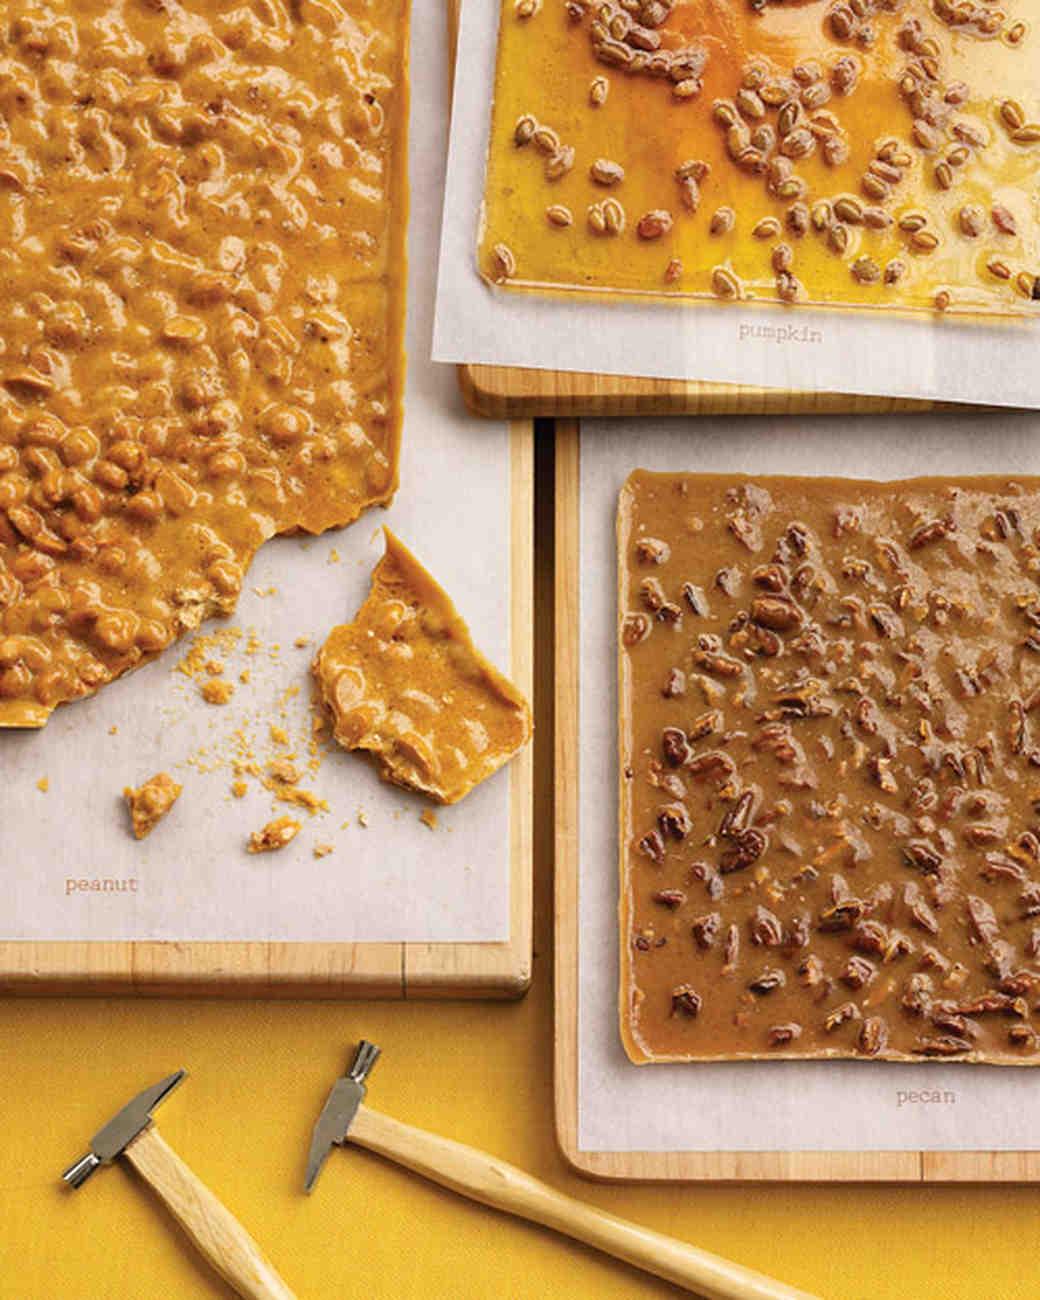 Fall Foods For Wedding: Peanut Brittle